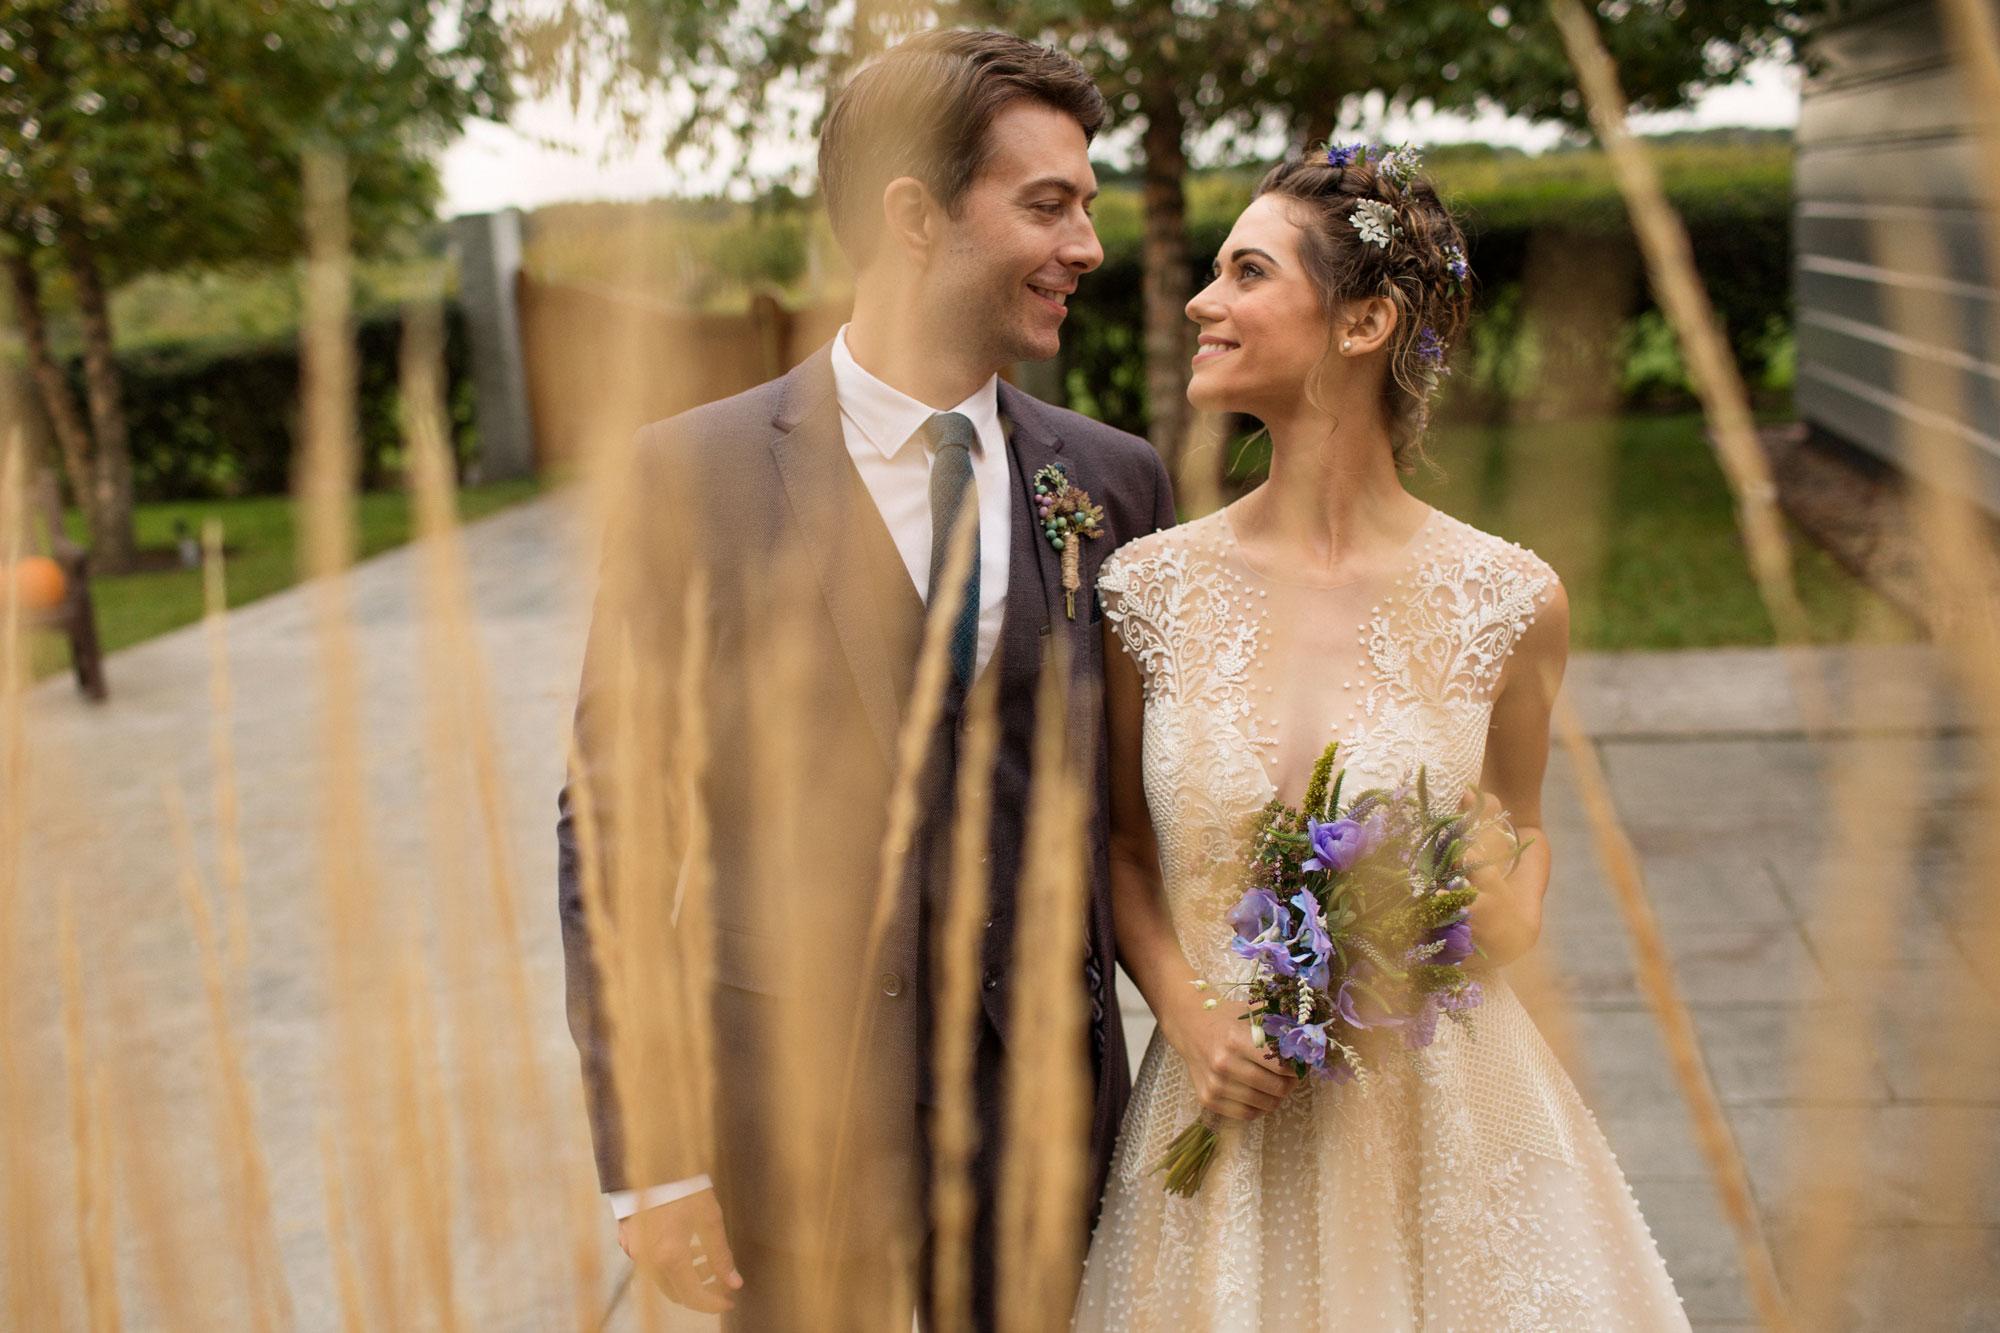 Inside Weddings Spring 2017 issue Lyndsy Fonseca and Noah Bean actress and actor wedding Nikita